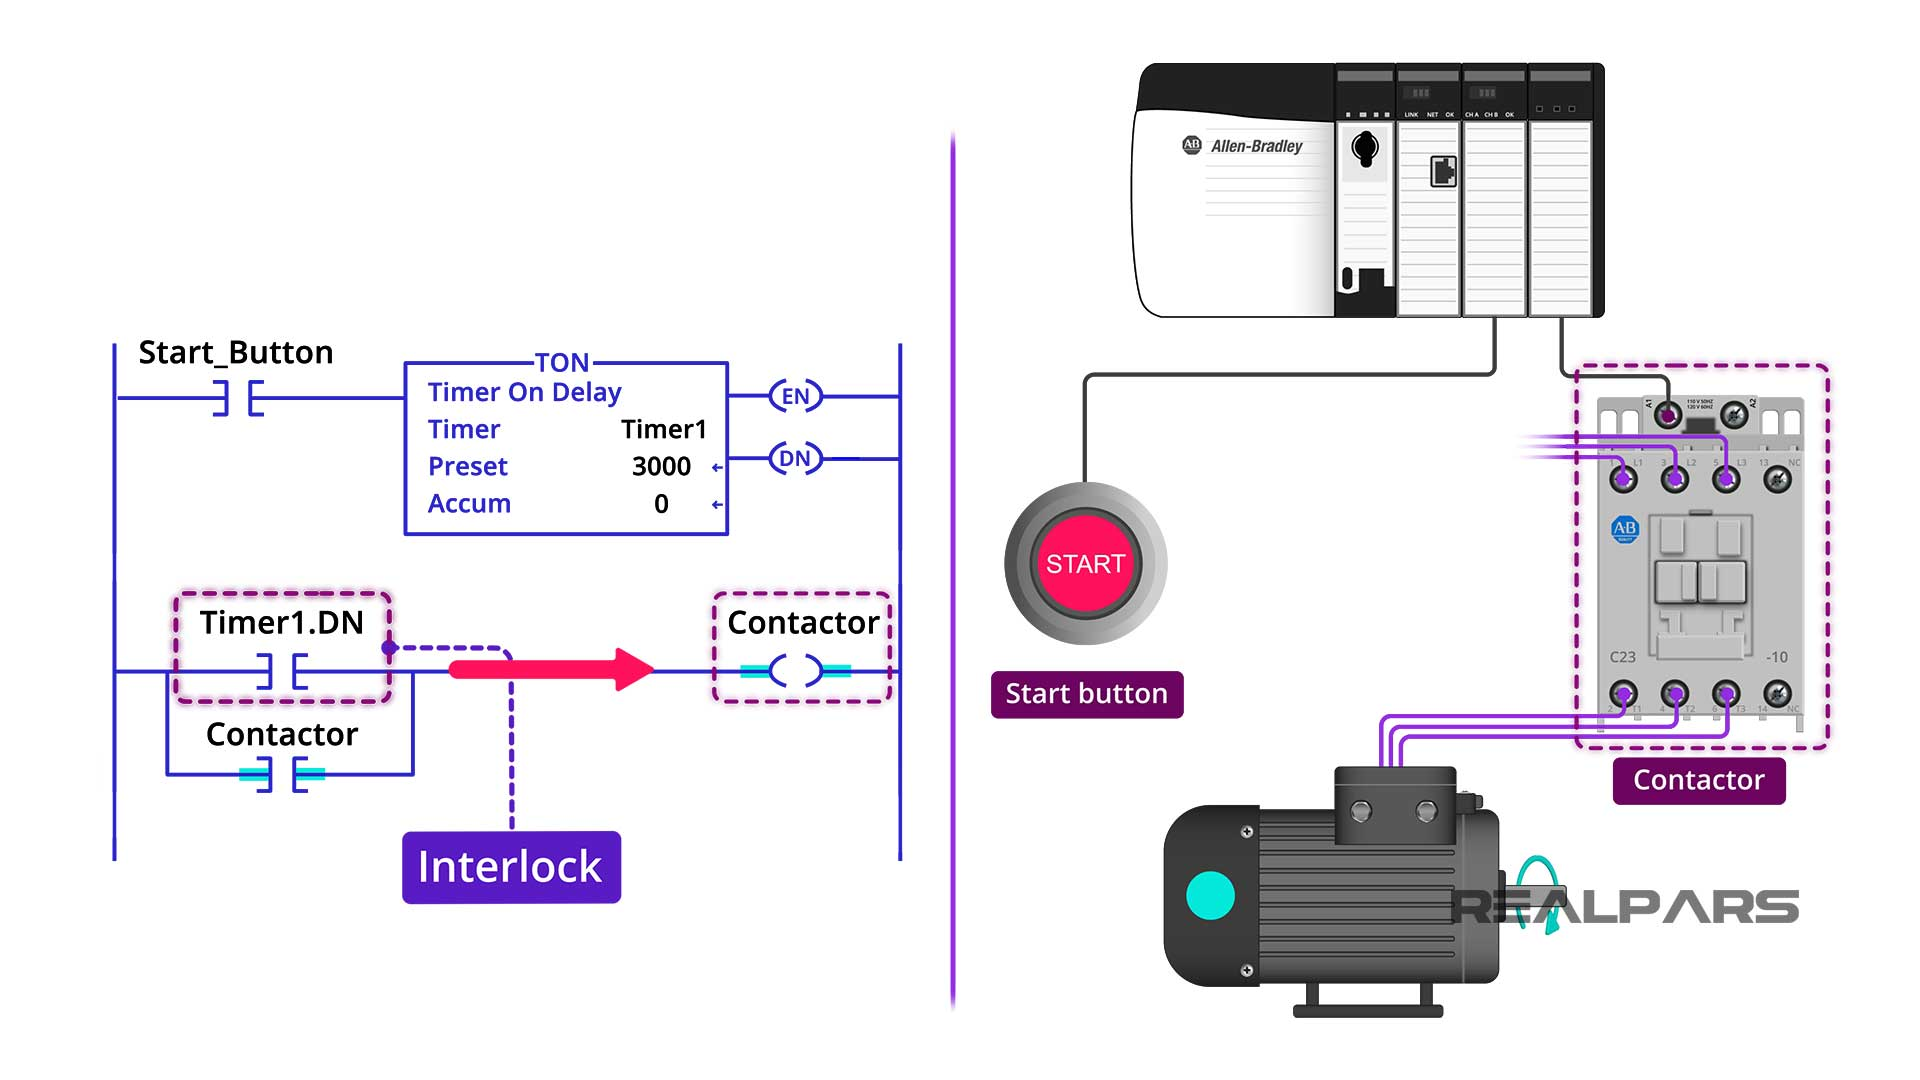 Start button interlock program